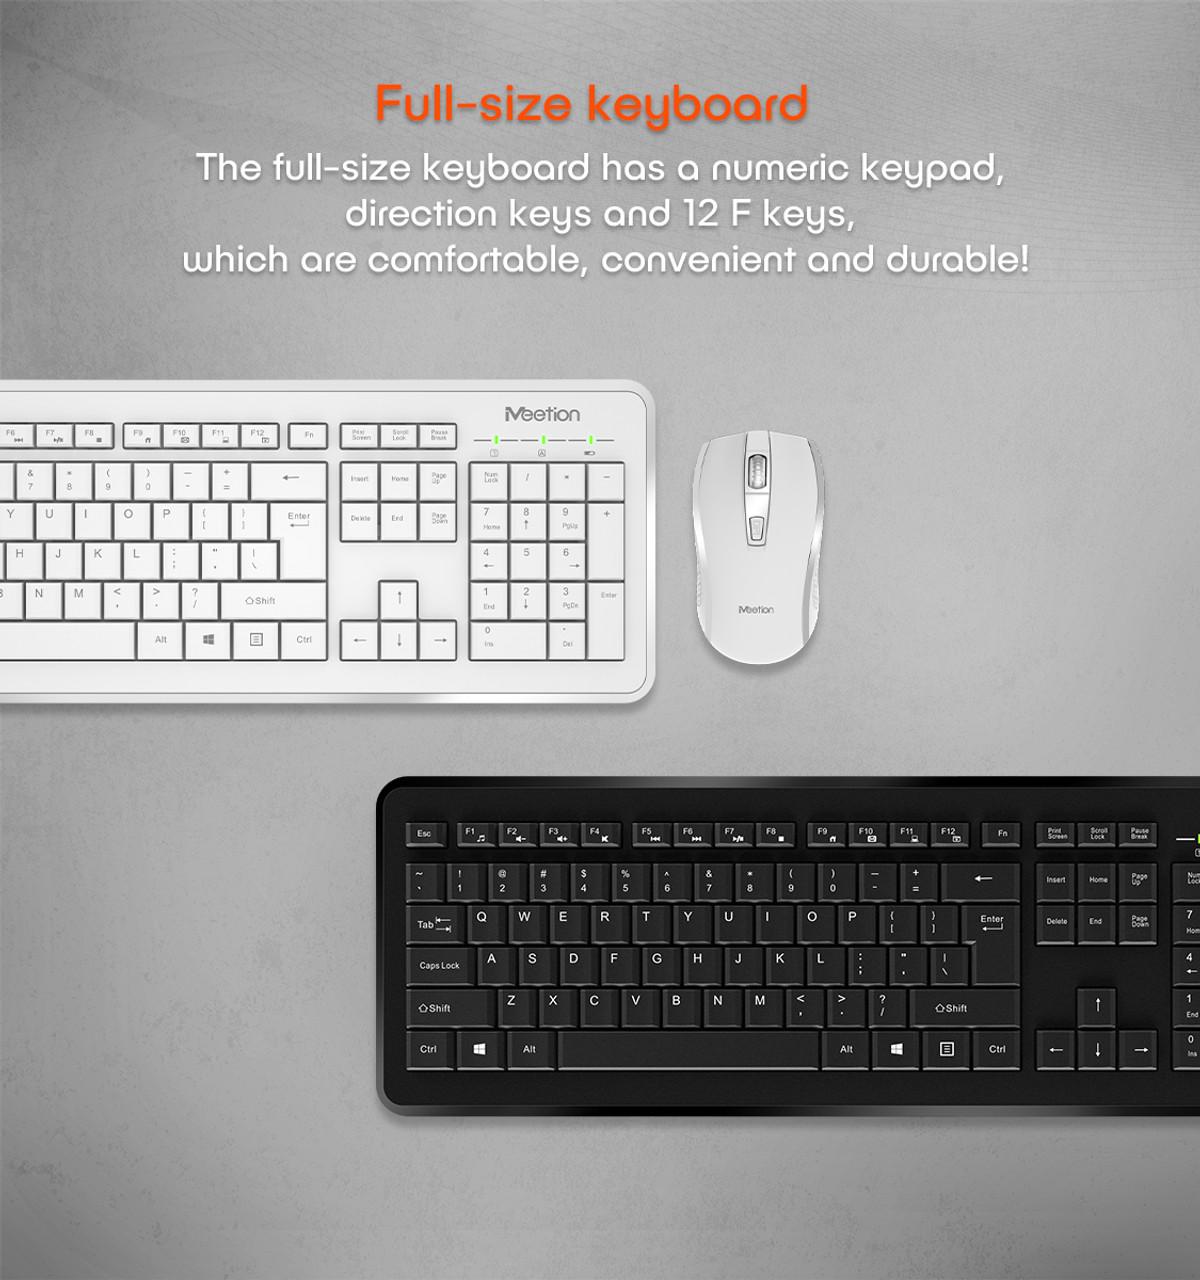 MEETION Wireless Keyboard and Mice Combo